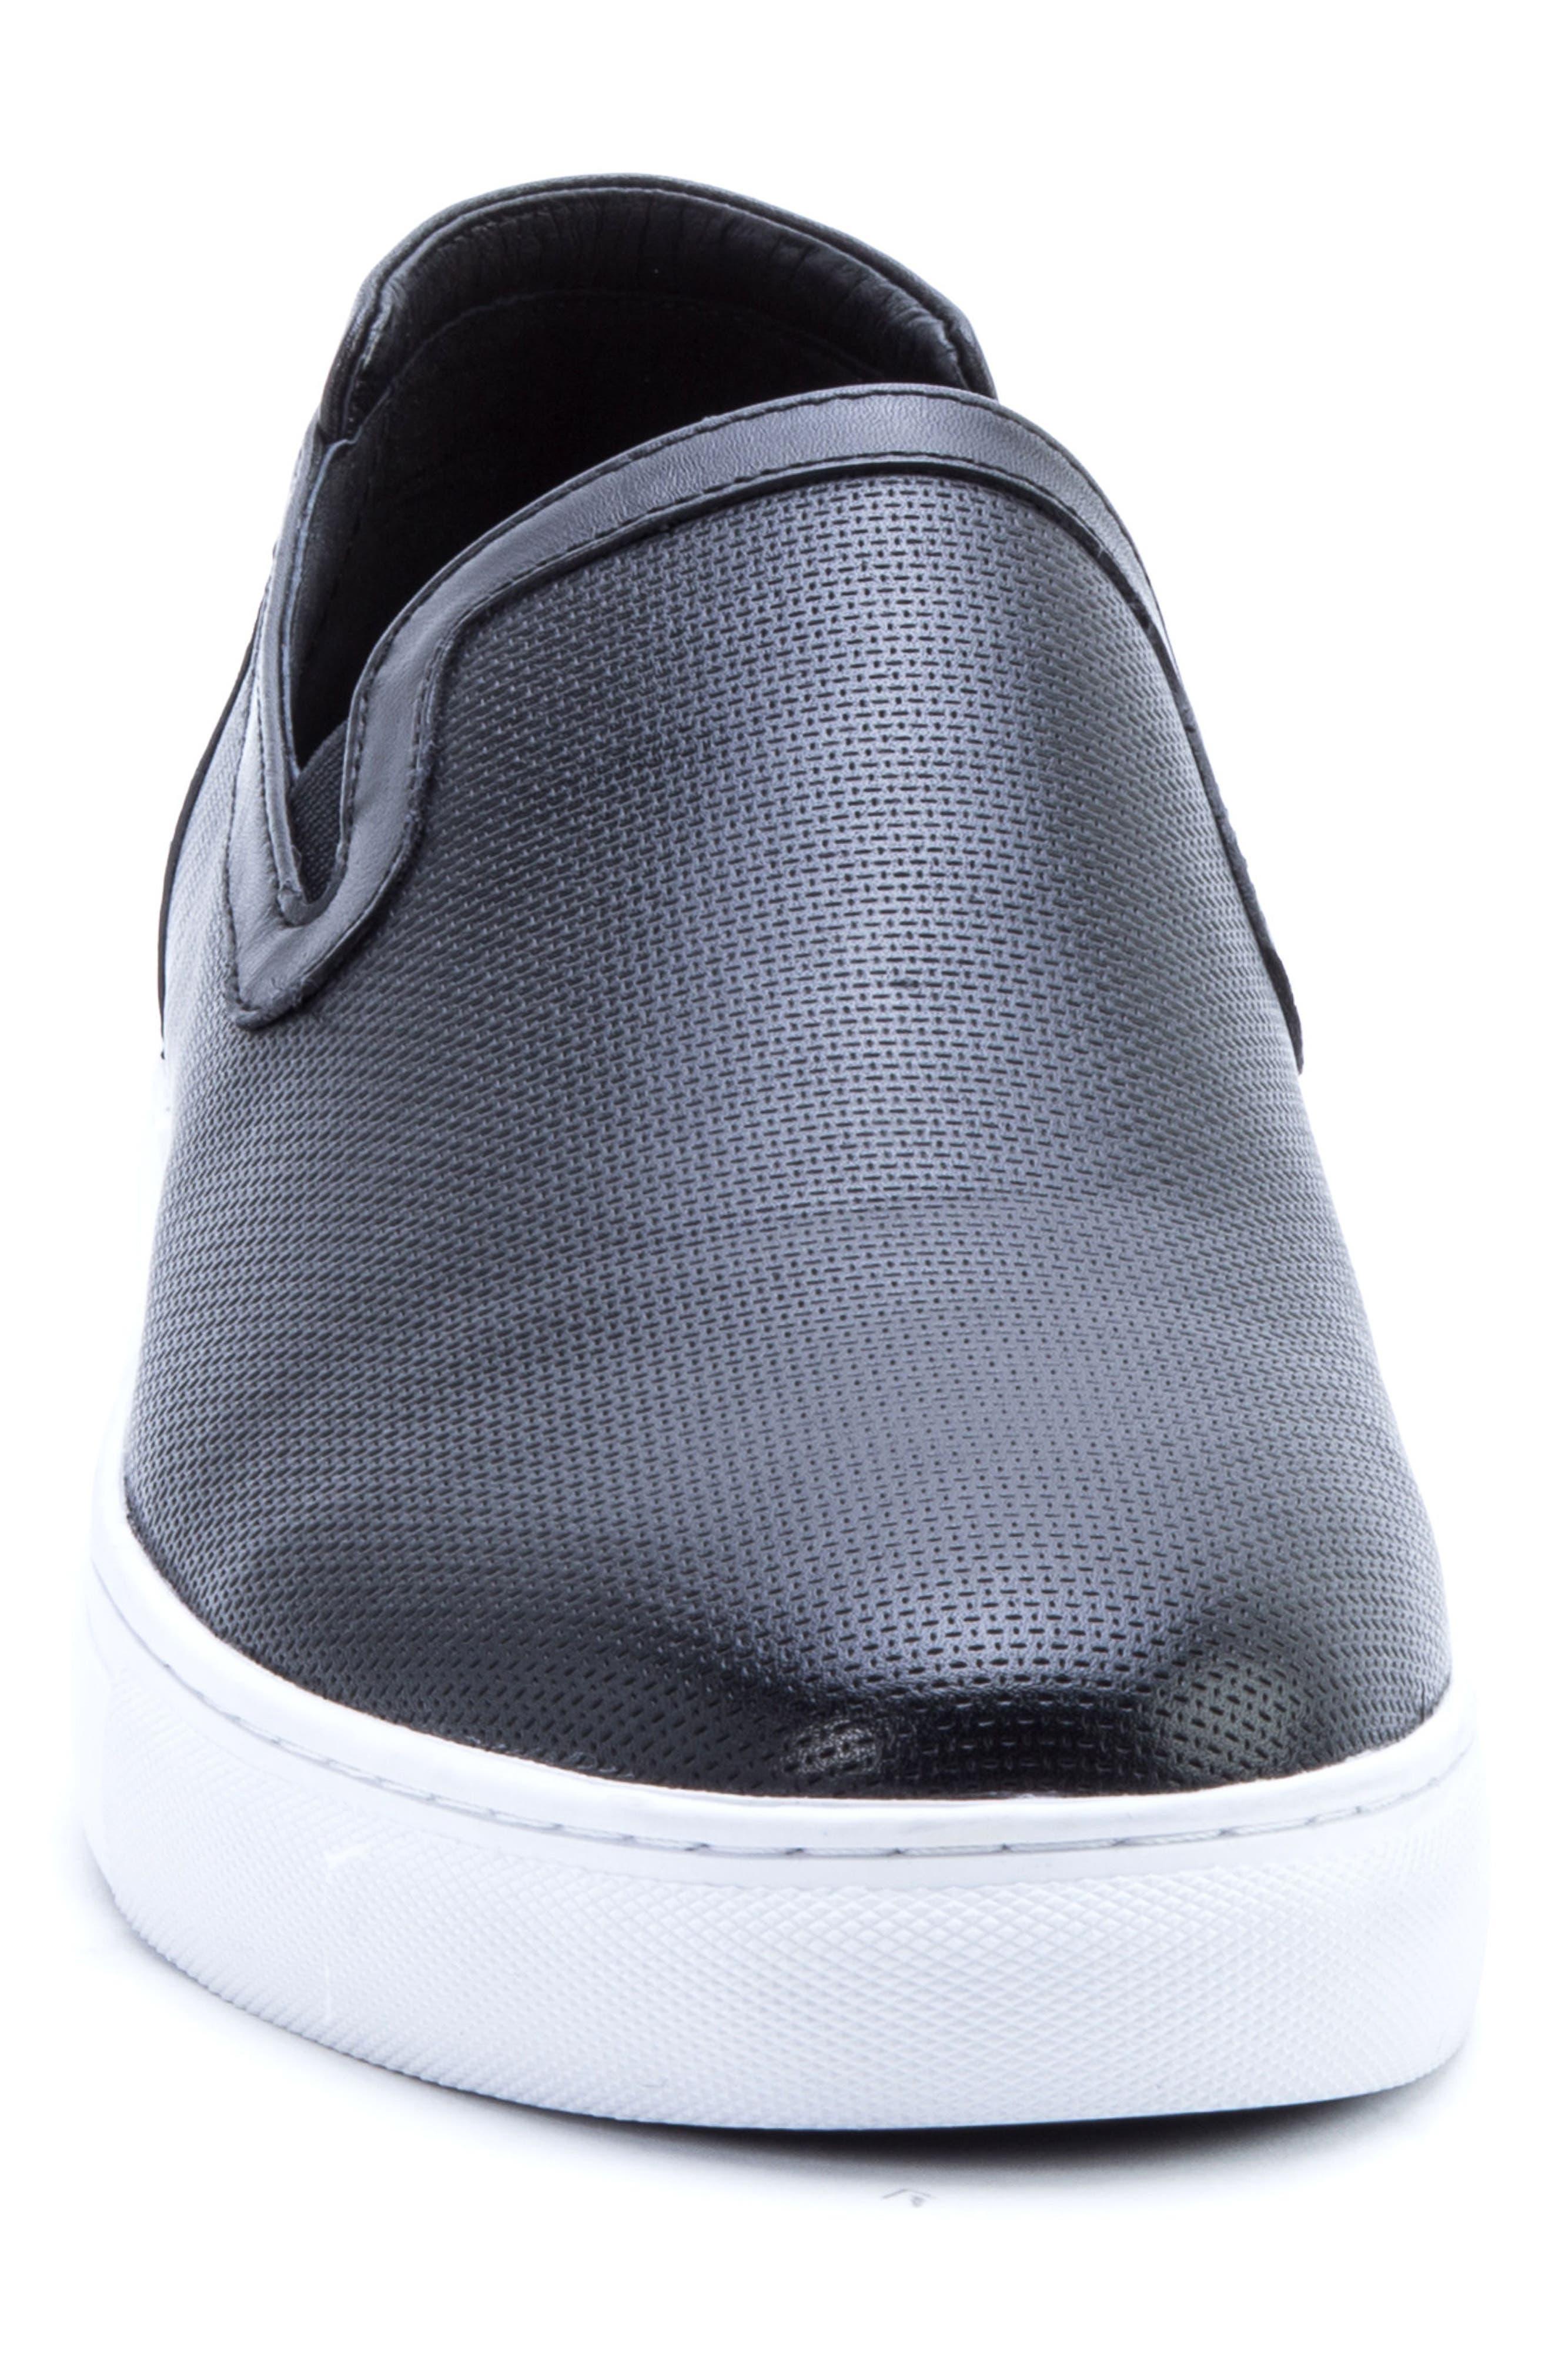 Grant Sneaker,                             Alternate thumbnail 4, color,                             BLACK LEATHER